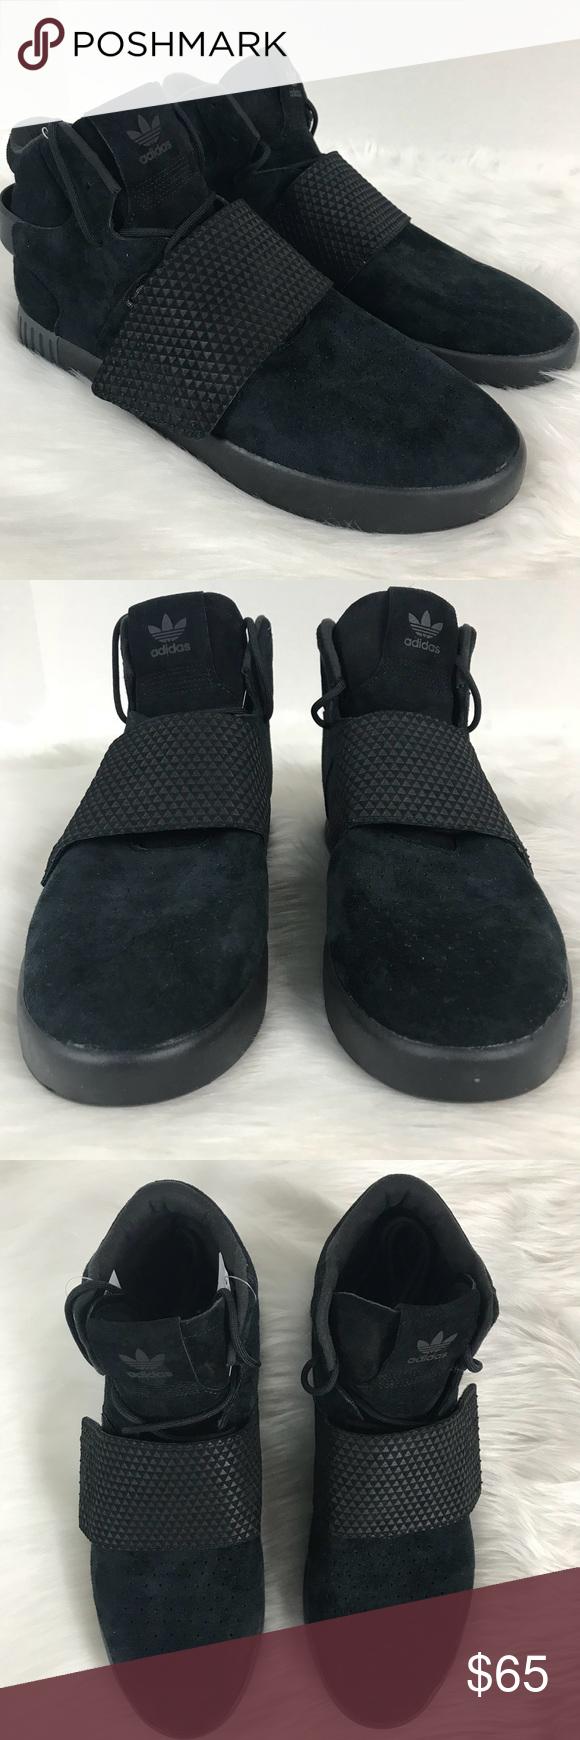 Adidas tubulare cinghia triplo velluto nero taglia 10 adidas originali